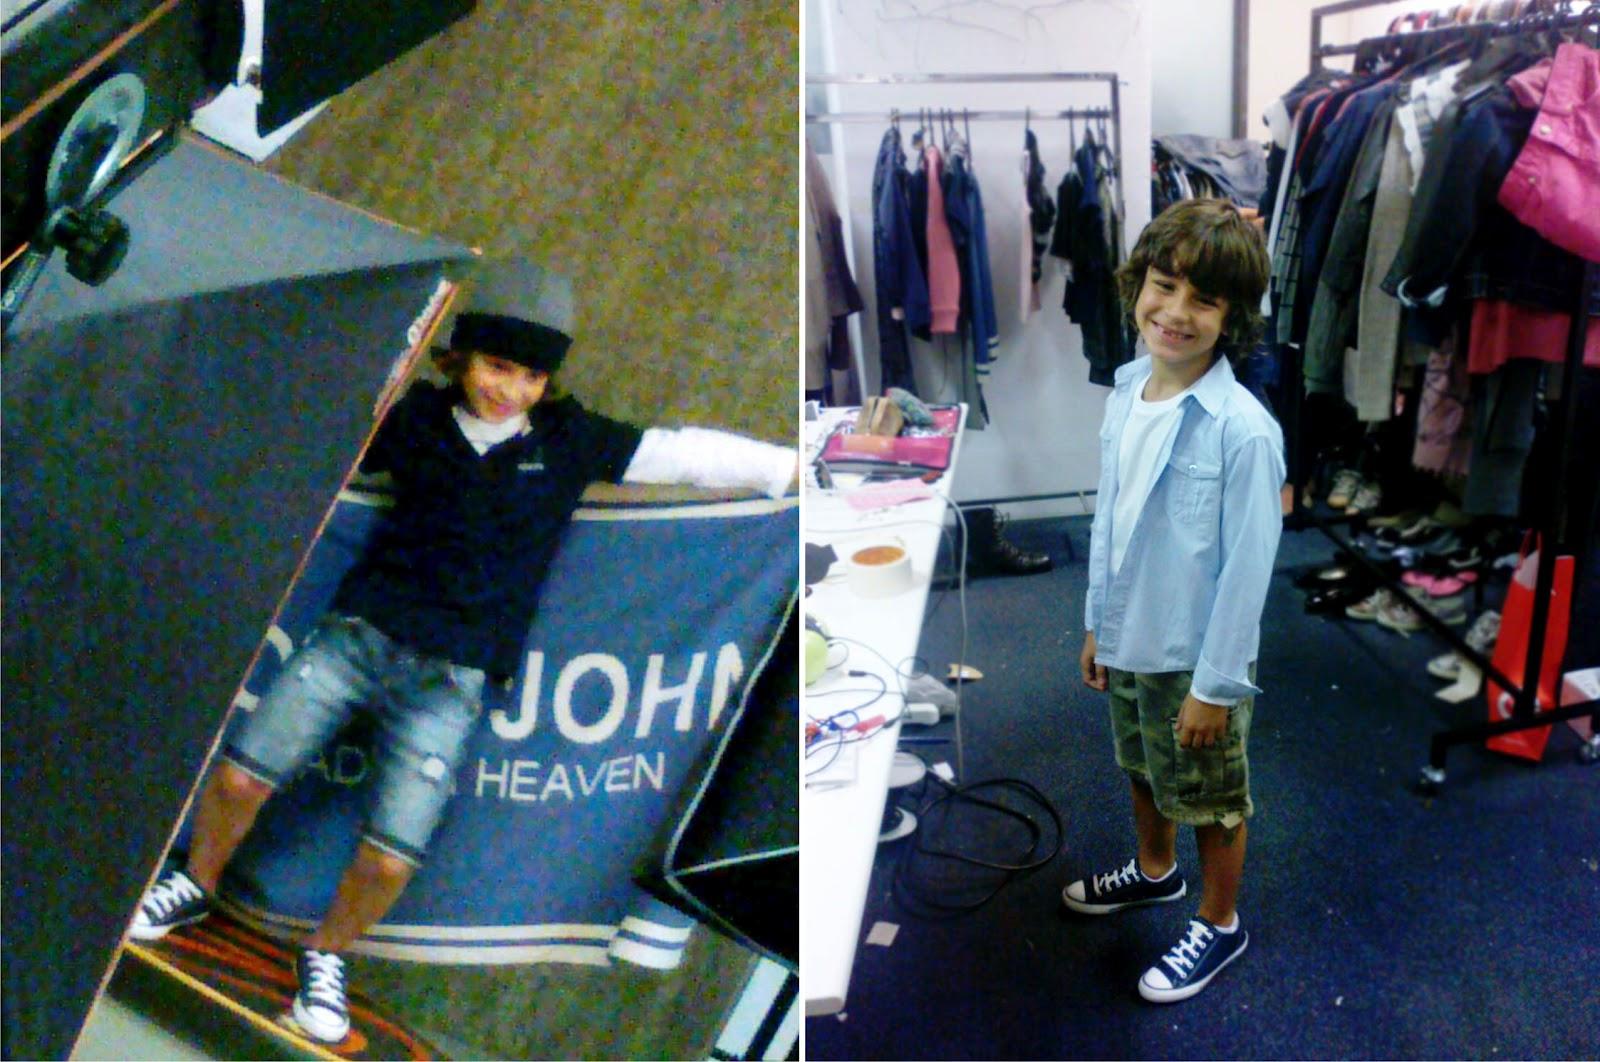 http://3.bp.blogspot.com/-c5wyGX3OiJY/T06C87AtY1I/AAAAAAAABhc/FLDv3BN54zk/s1600/Gabriel+Naranjo_John+John+Denin_making+of_nini+casting3.jpg